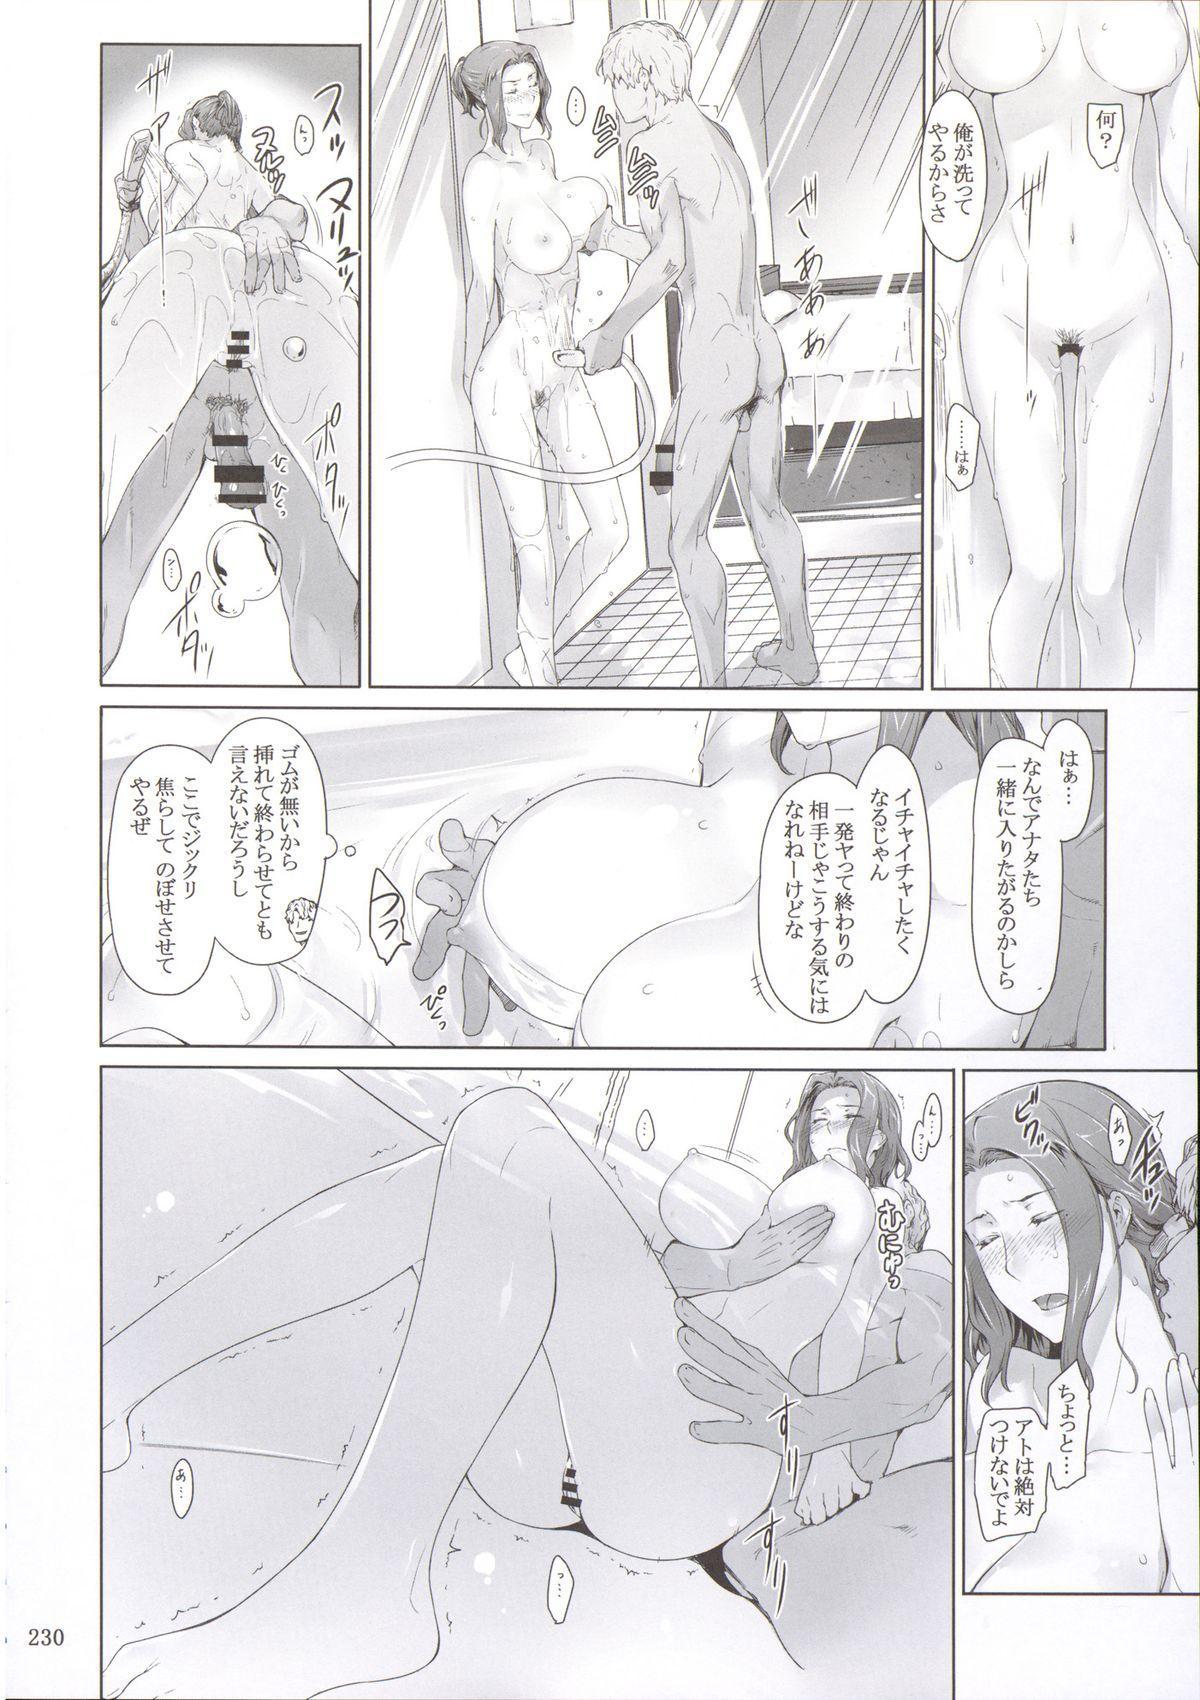 (C86) [MTSP (Jin)] Tachibana-san-chi no Dansei Jijou Matome Ban [Incomplete] 28